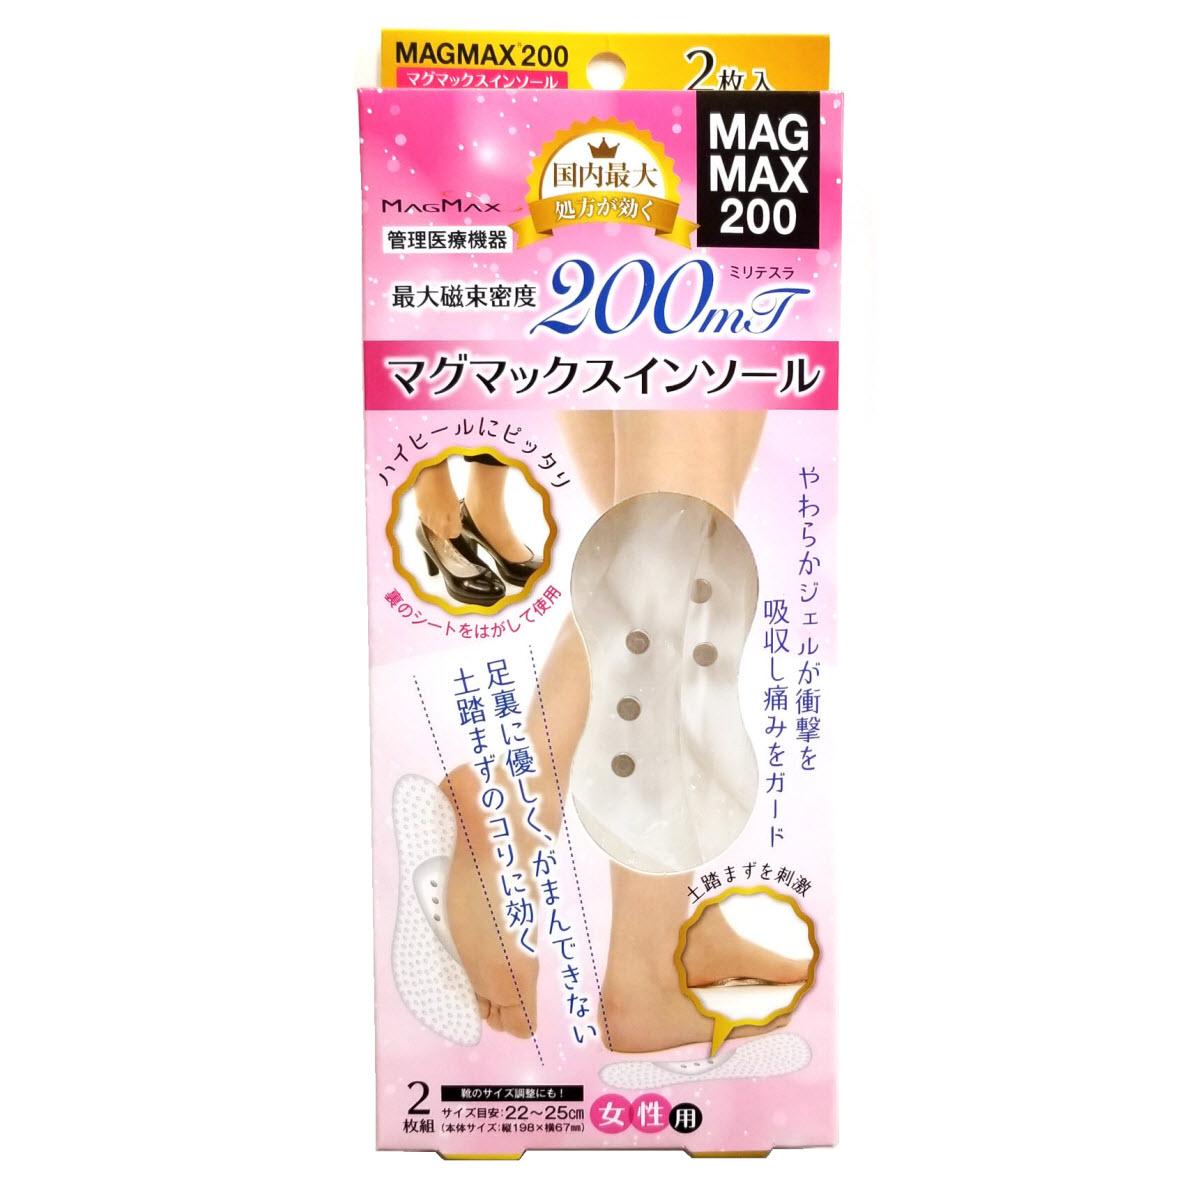 MAGMAX200 マグマックスインソール(女性用)※2019年9月よりパッケージ変更